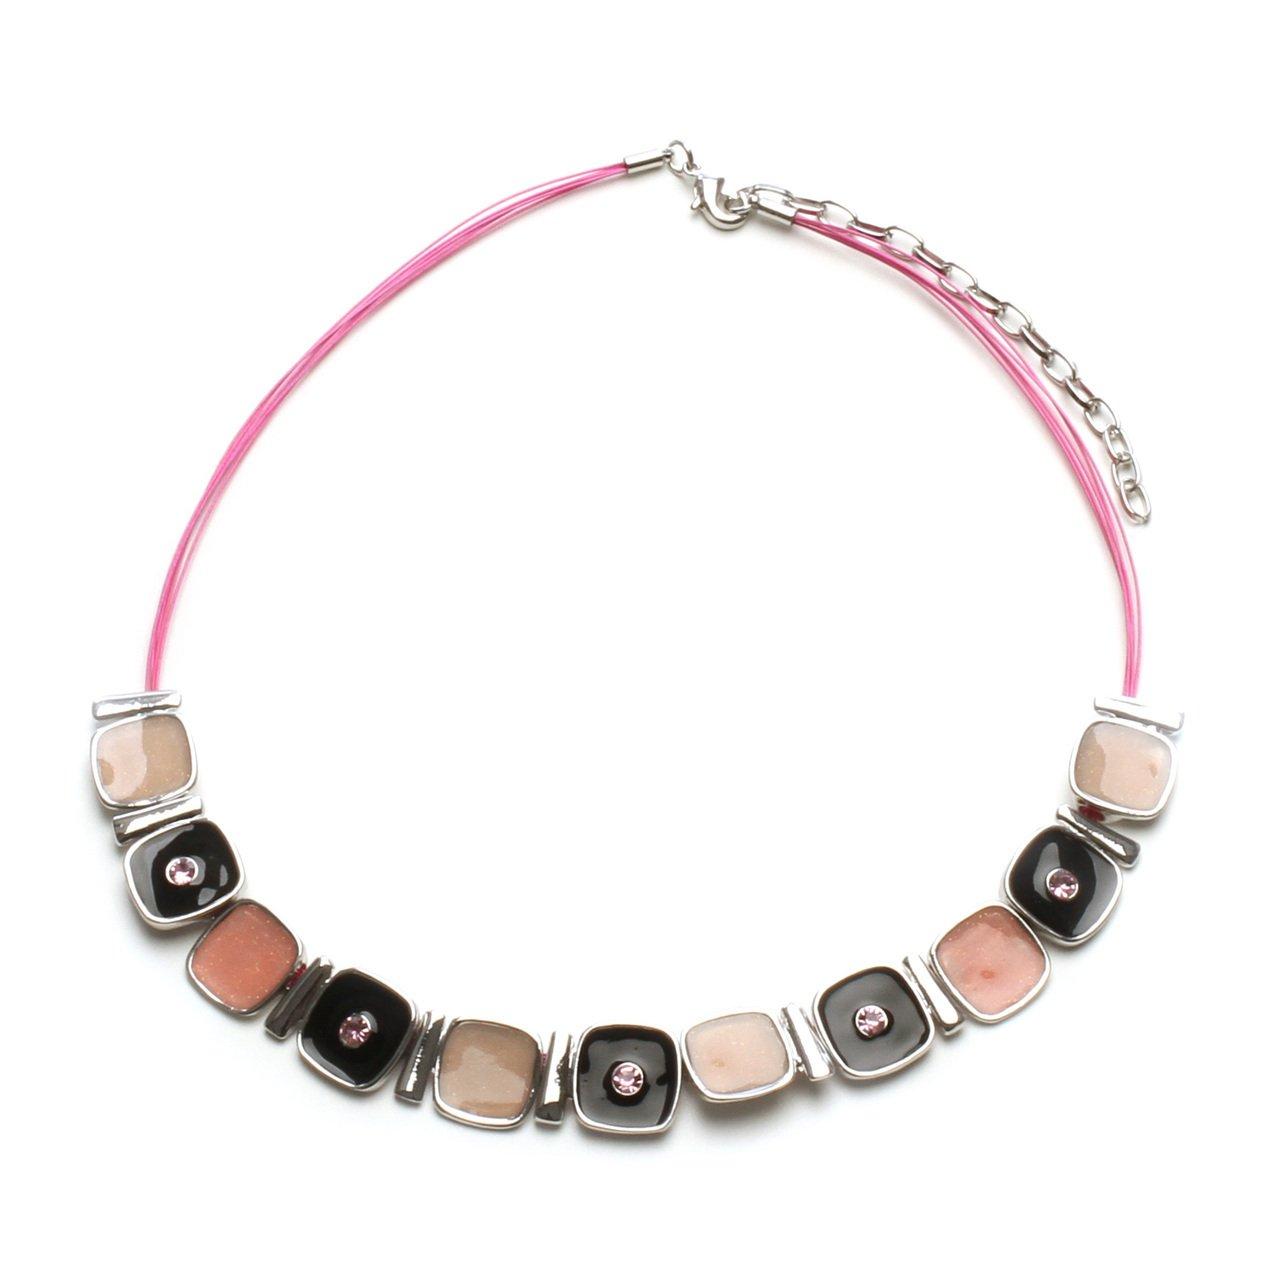 LookLove Women's Jewelry Pink Necklace